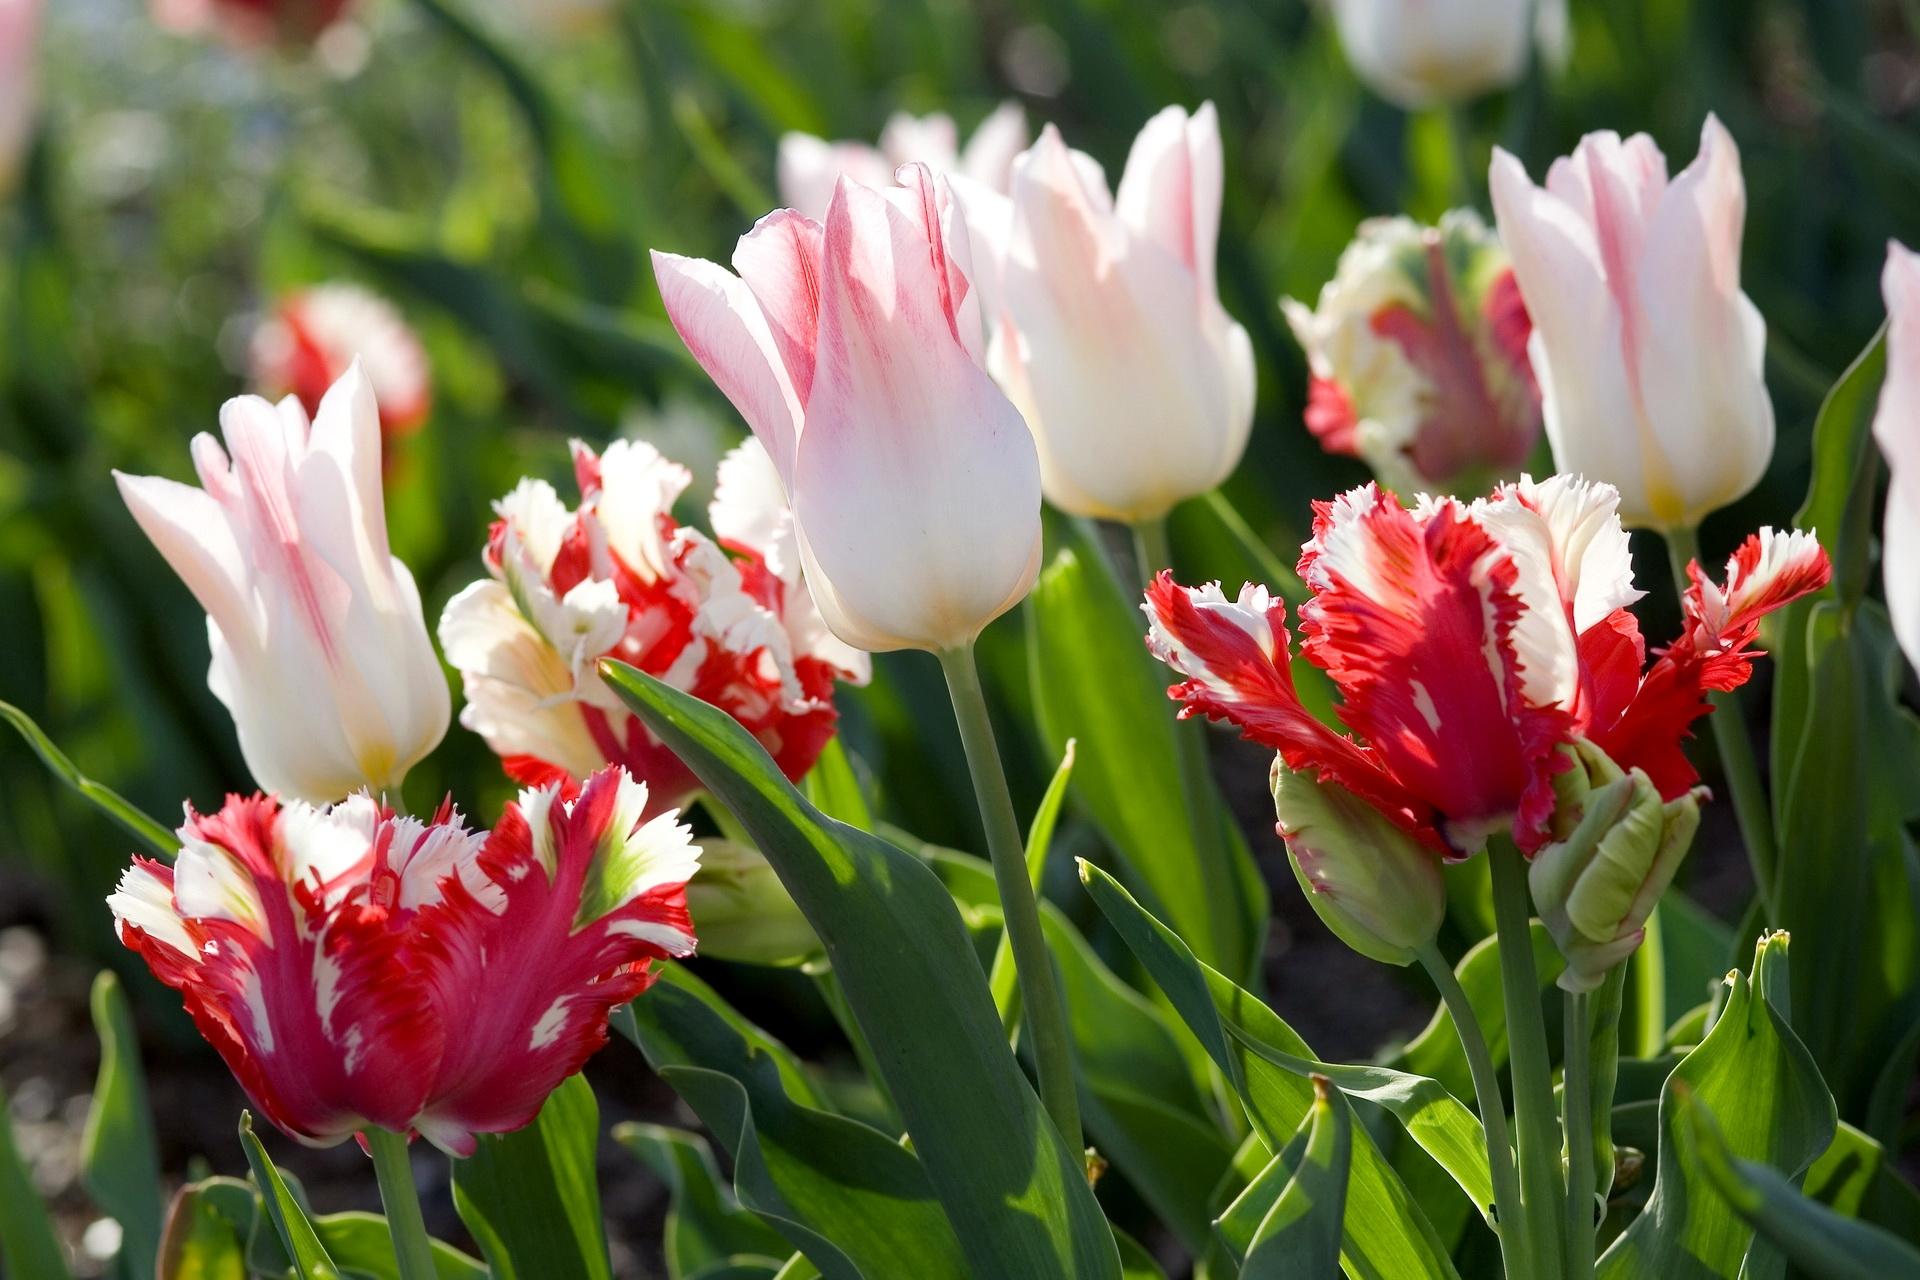 Картинки тюльпанов фото